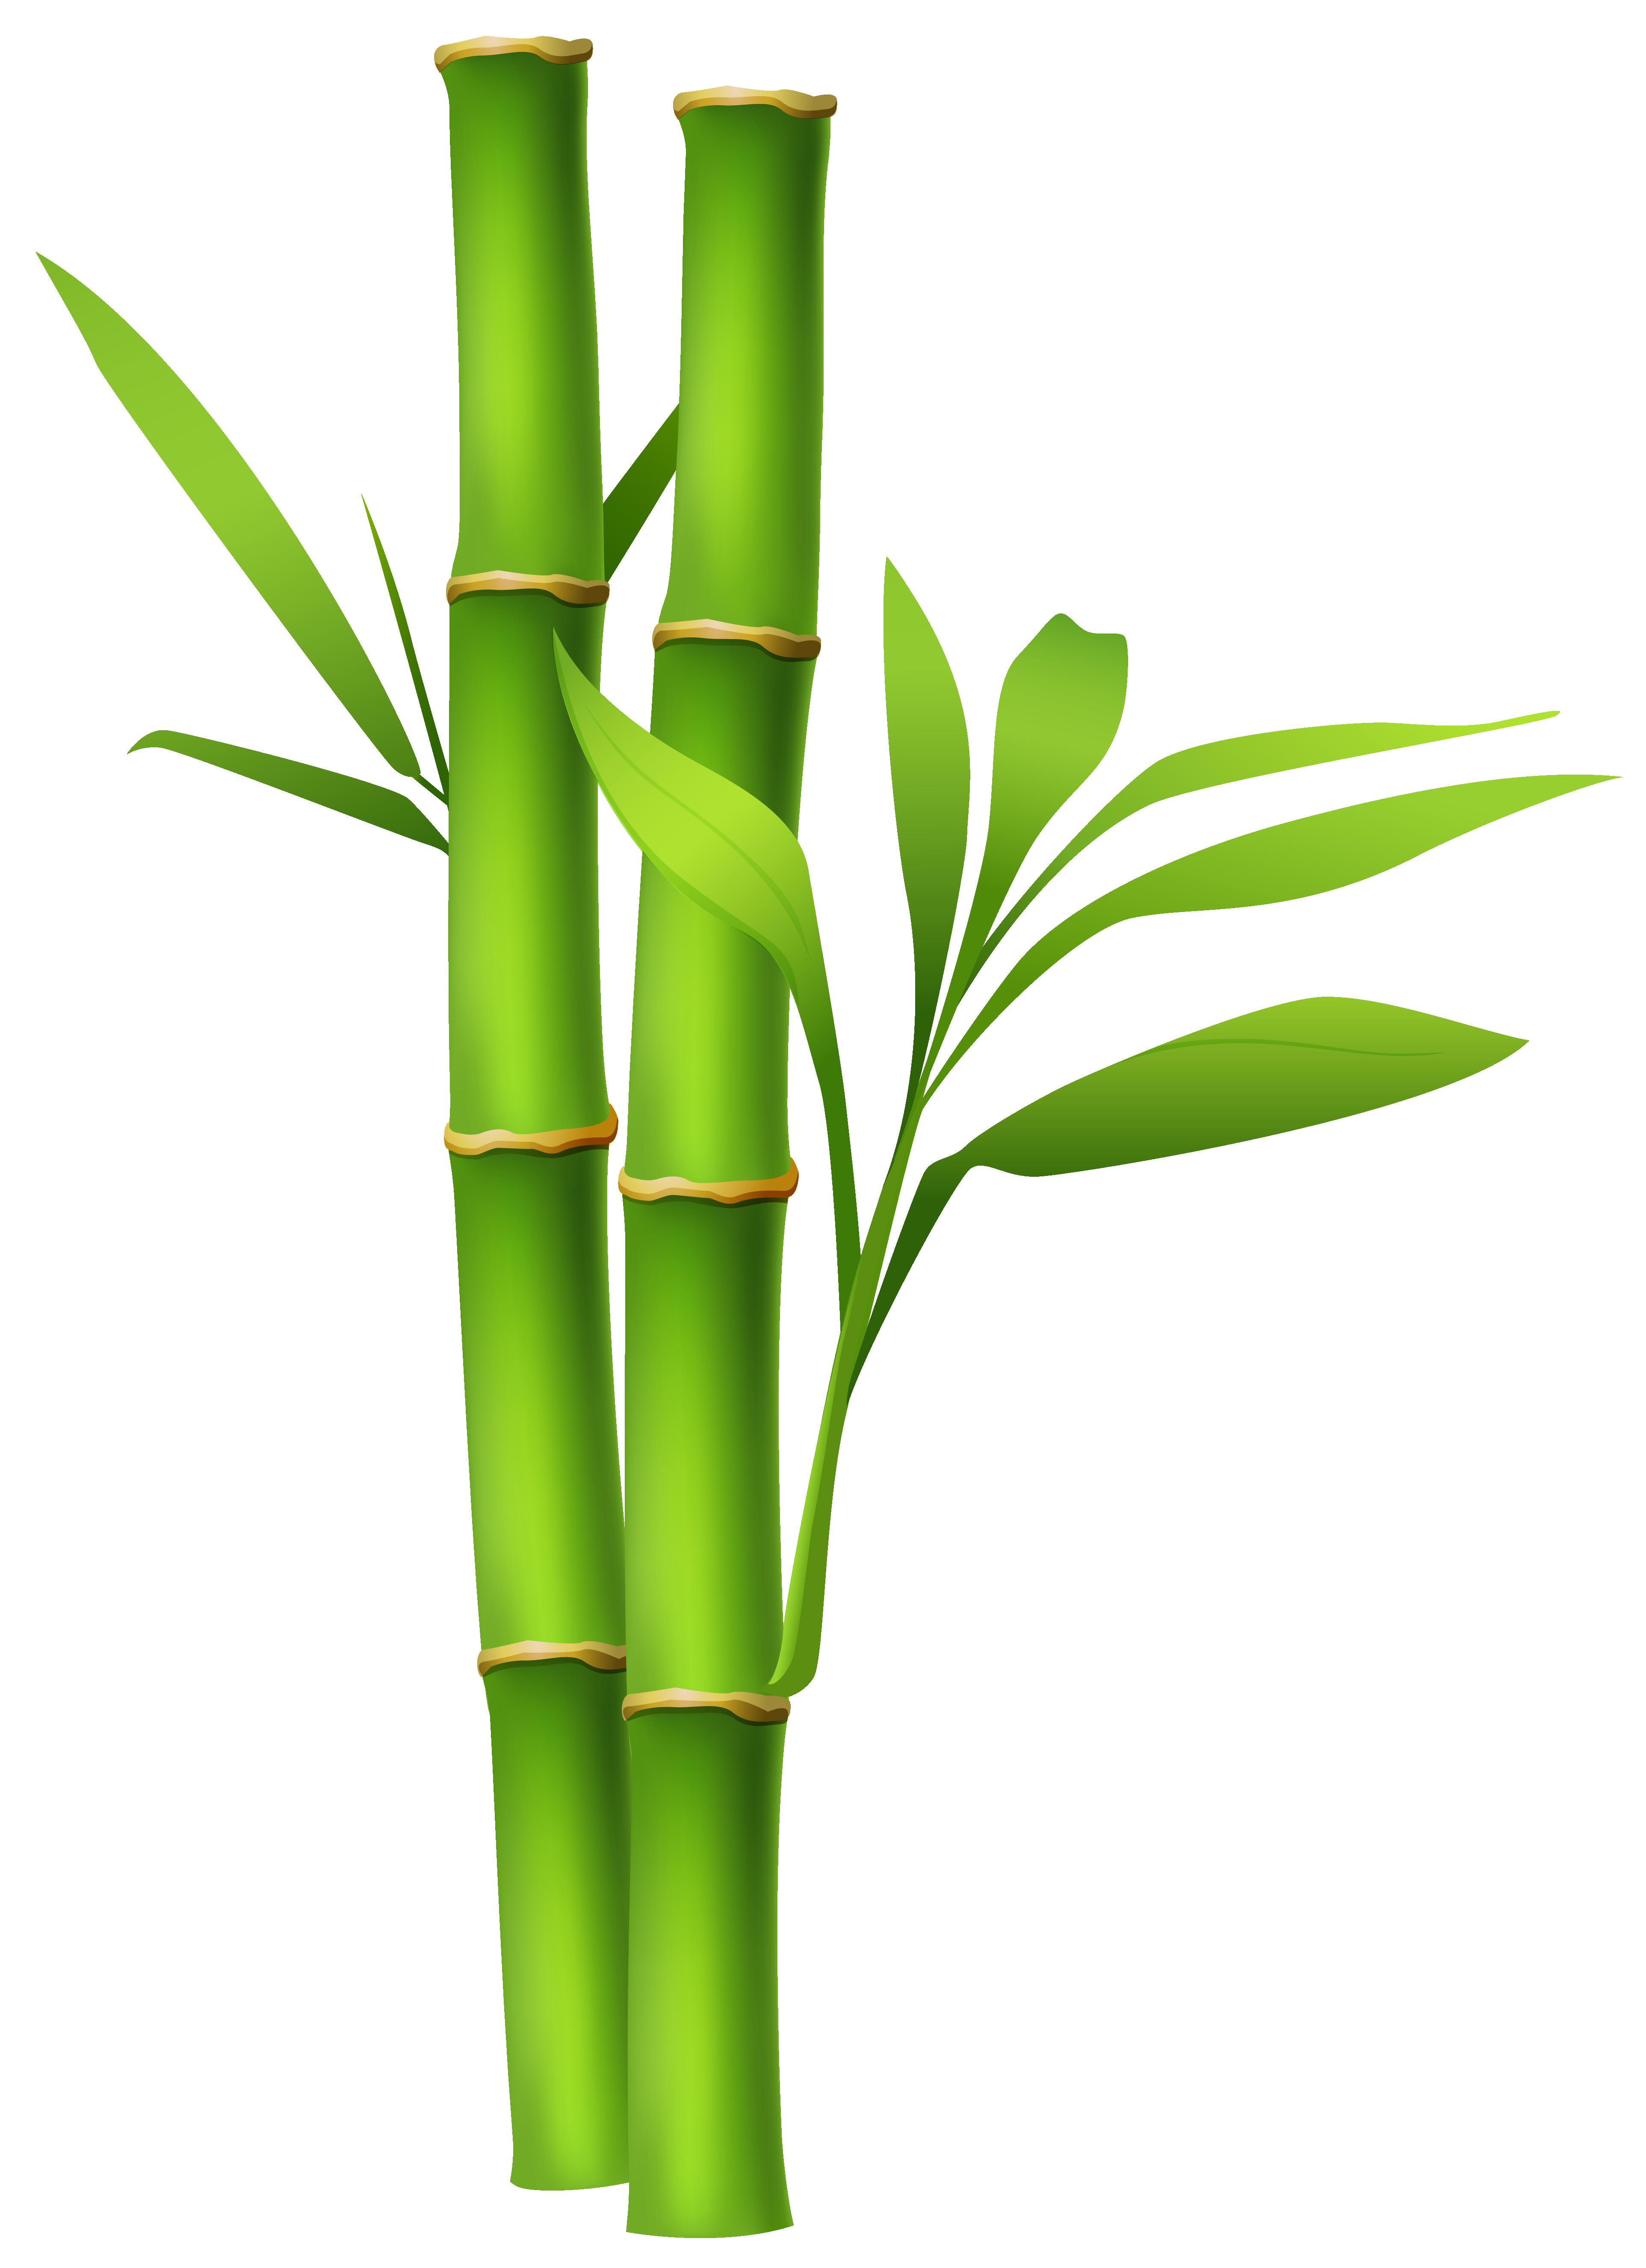 ... Bamboo Clipart - clipartall ...-... Bamboo Clipart - clipartall ...-2